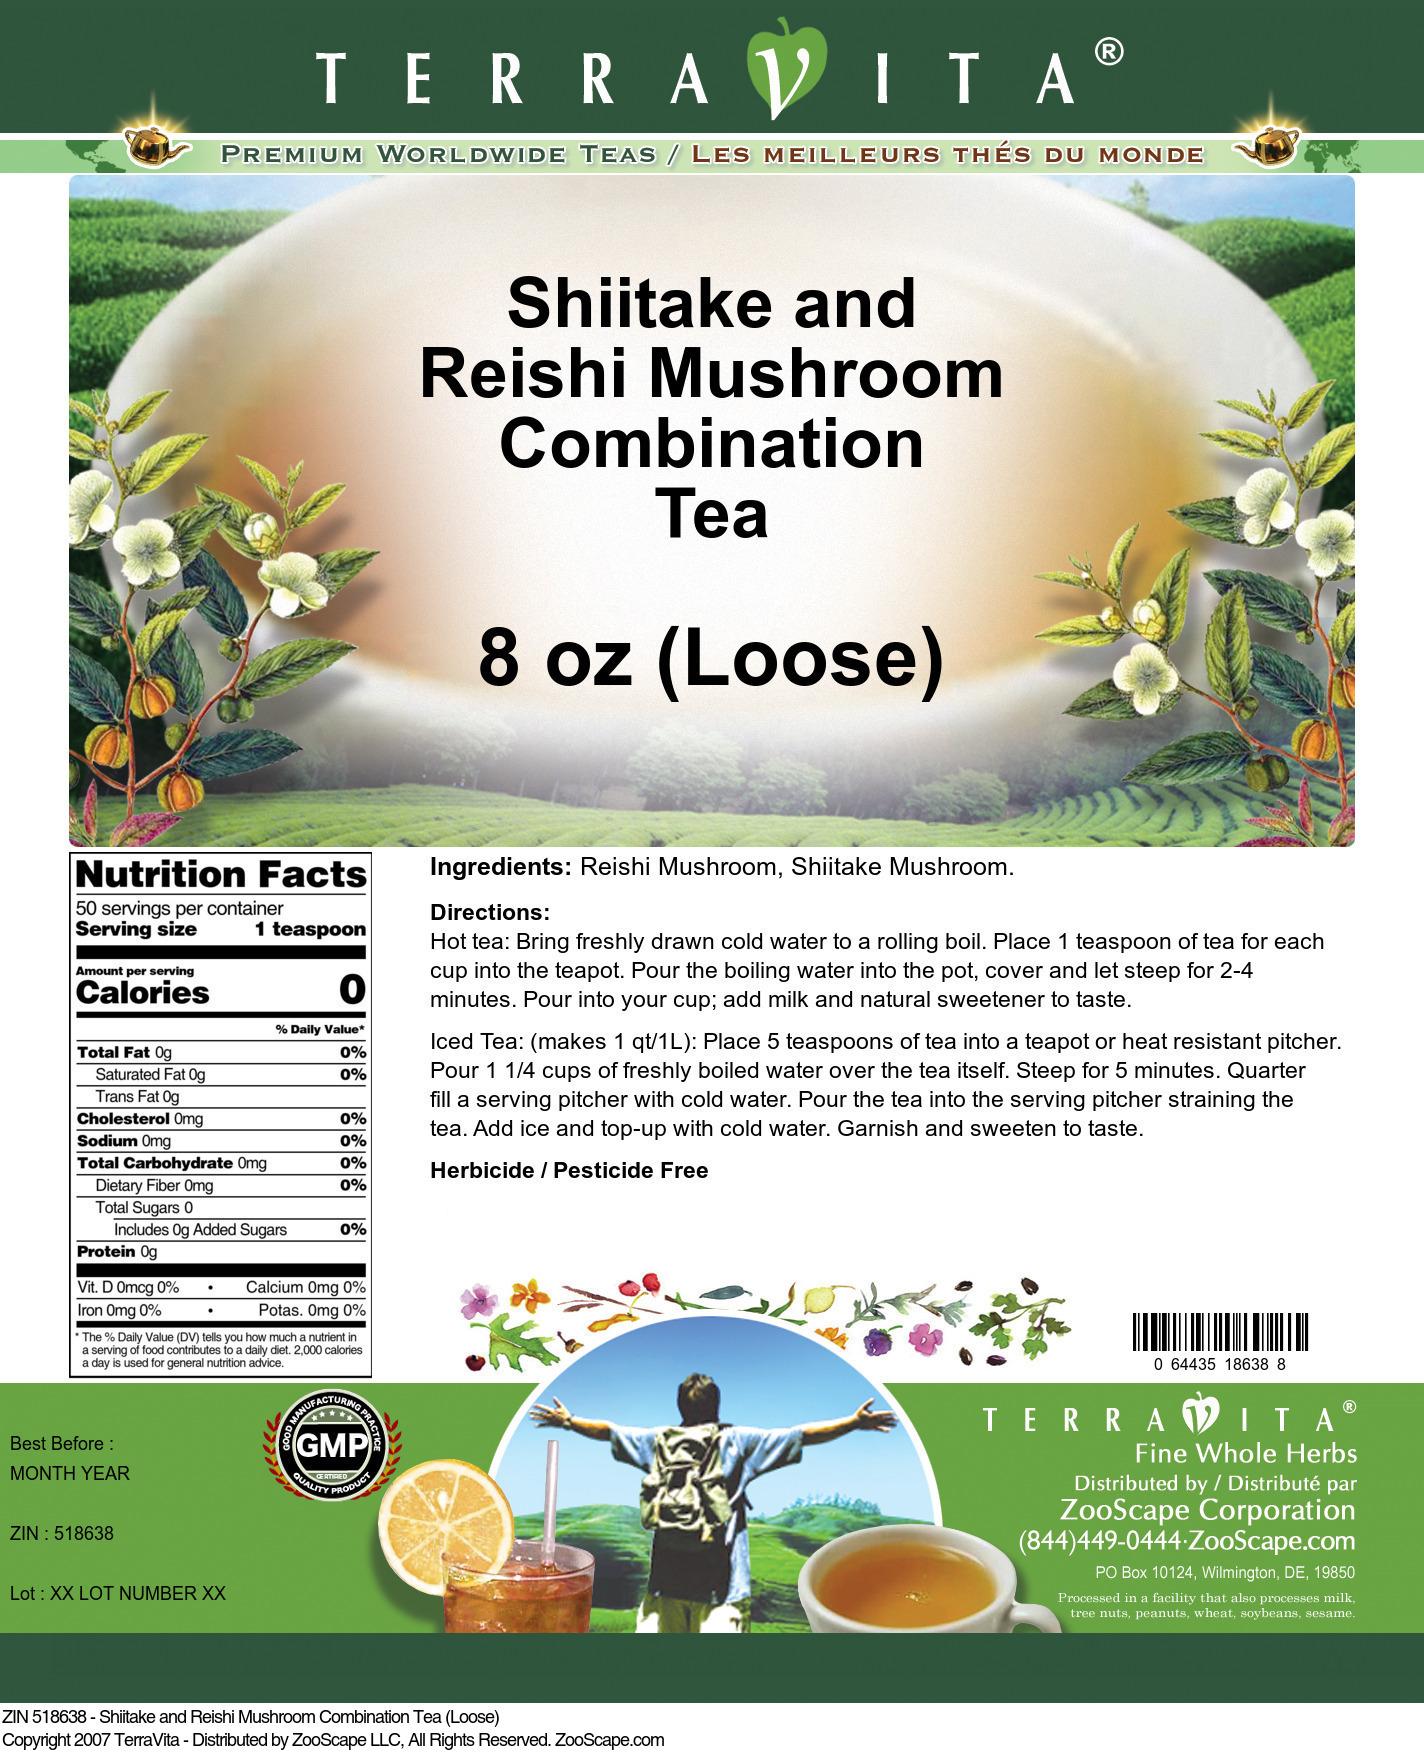 Shiitake and Reishi Mushroom Combination Tea (Loose)